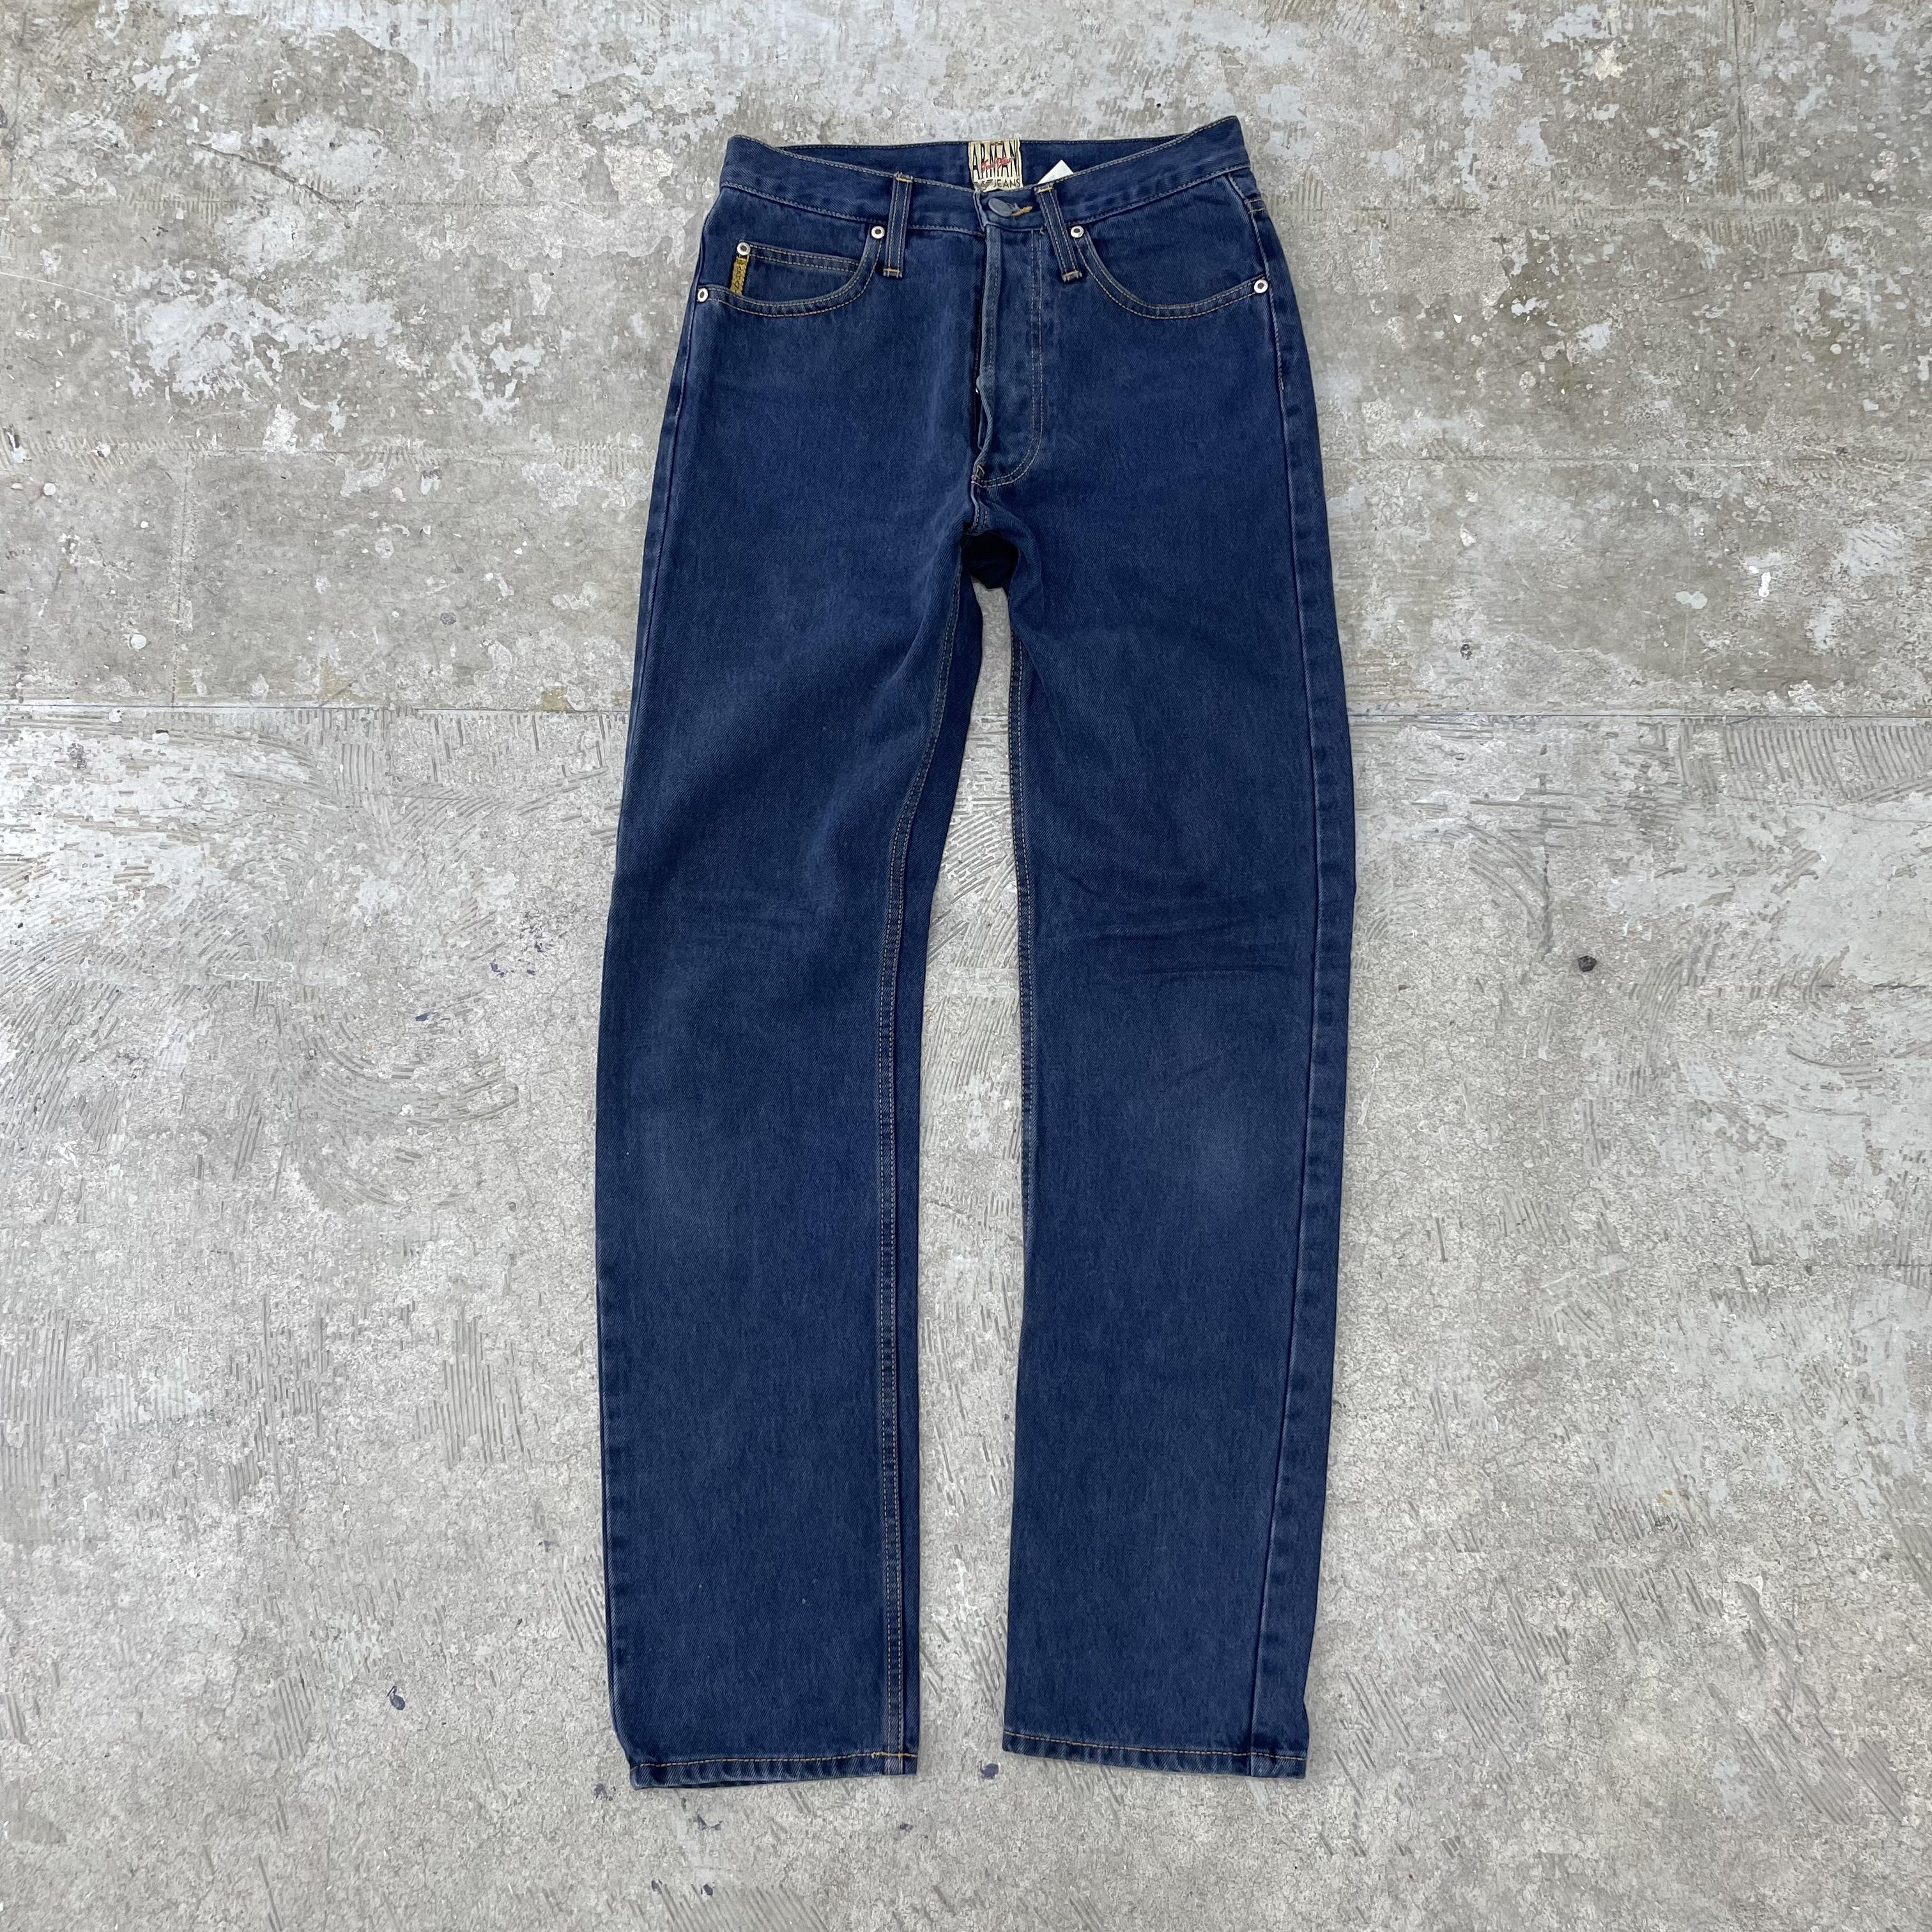 Armani Jeans / Size 30